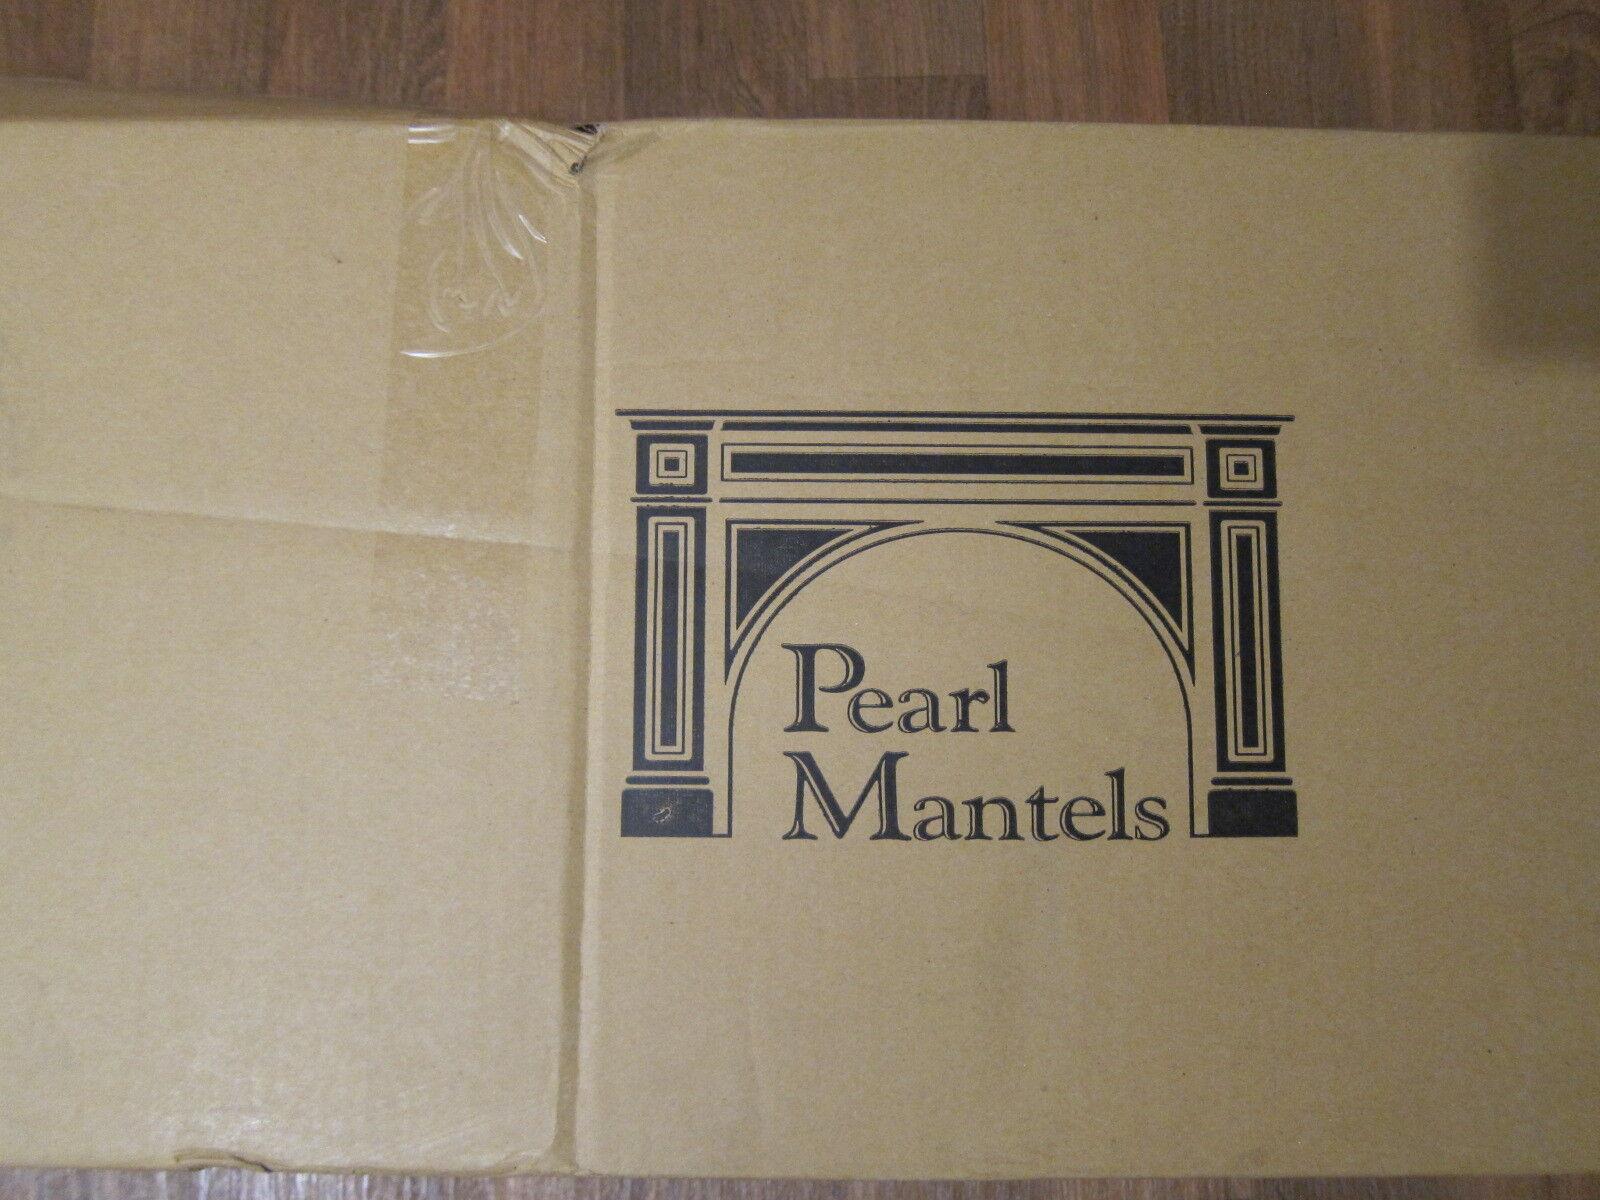 Pearl Mantels 412-60 Shenandoah Unfinished Pine Rustic Firep